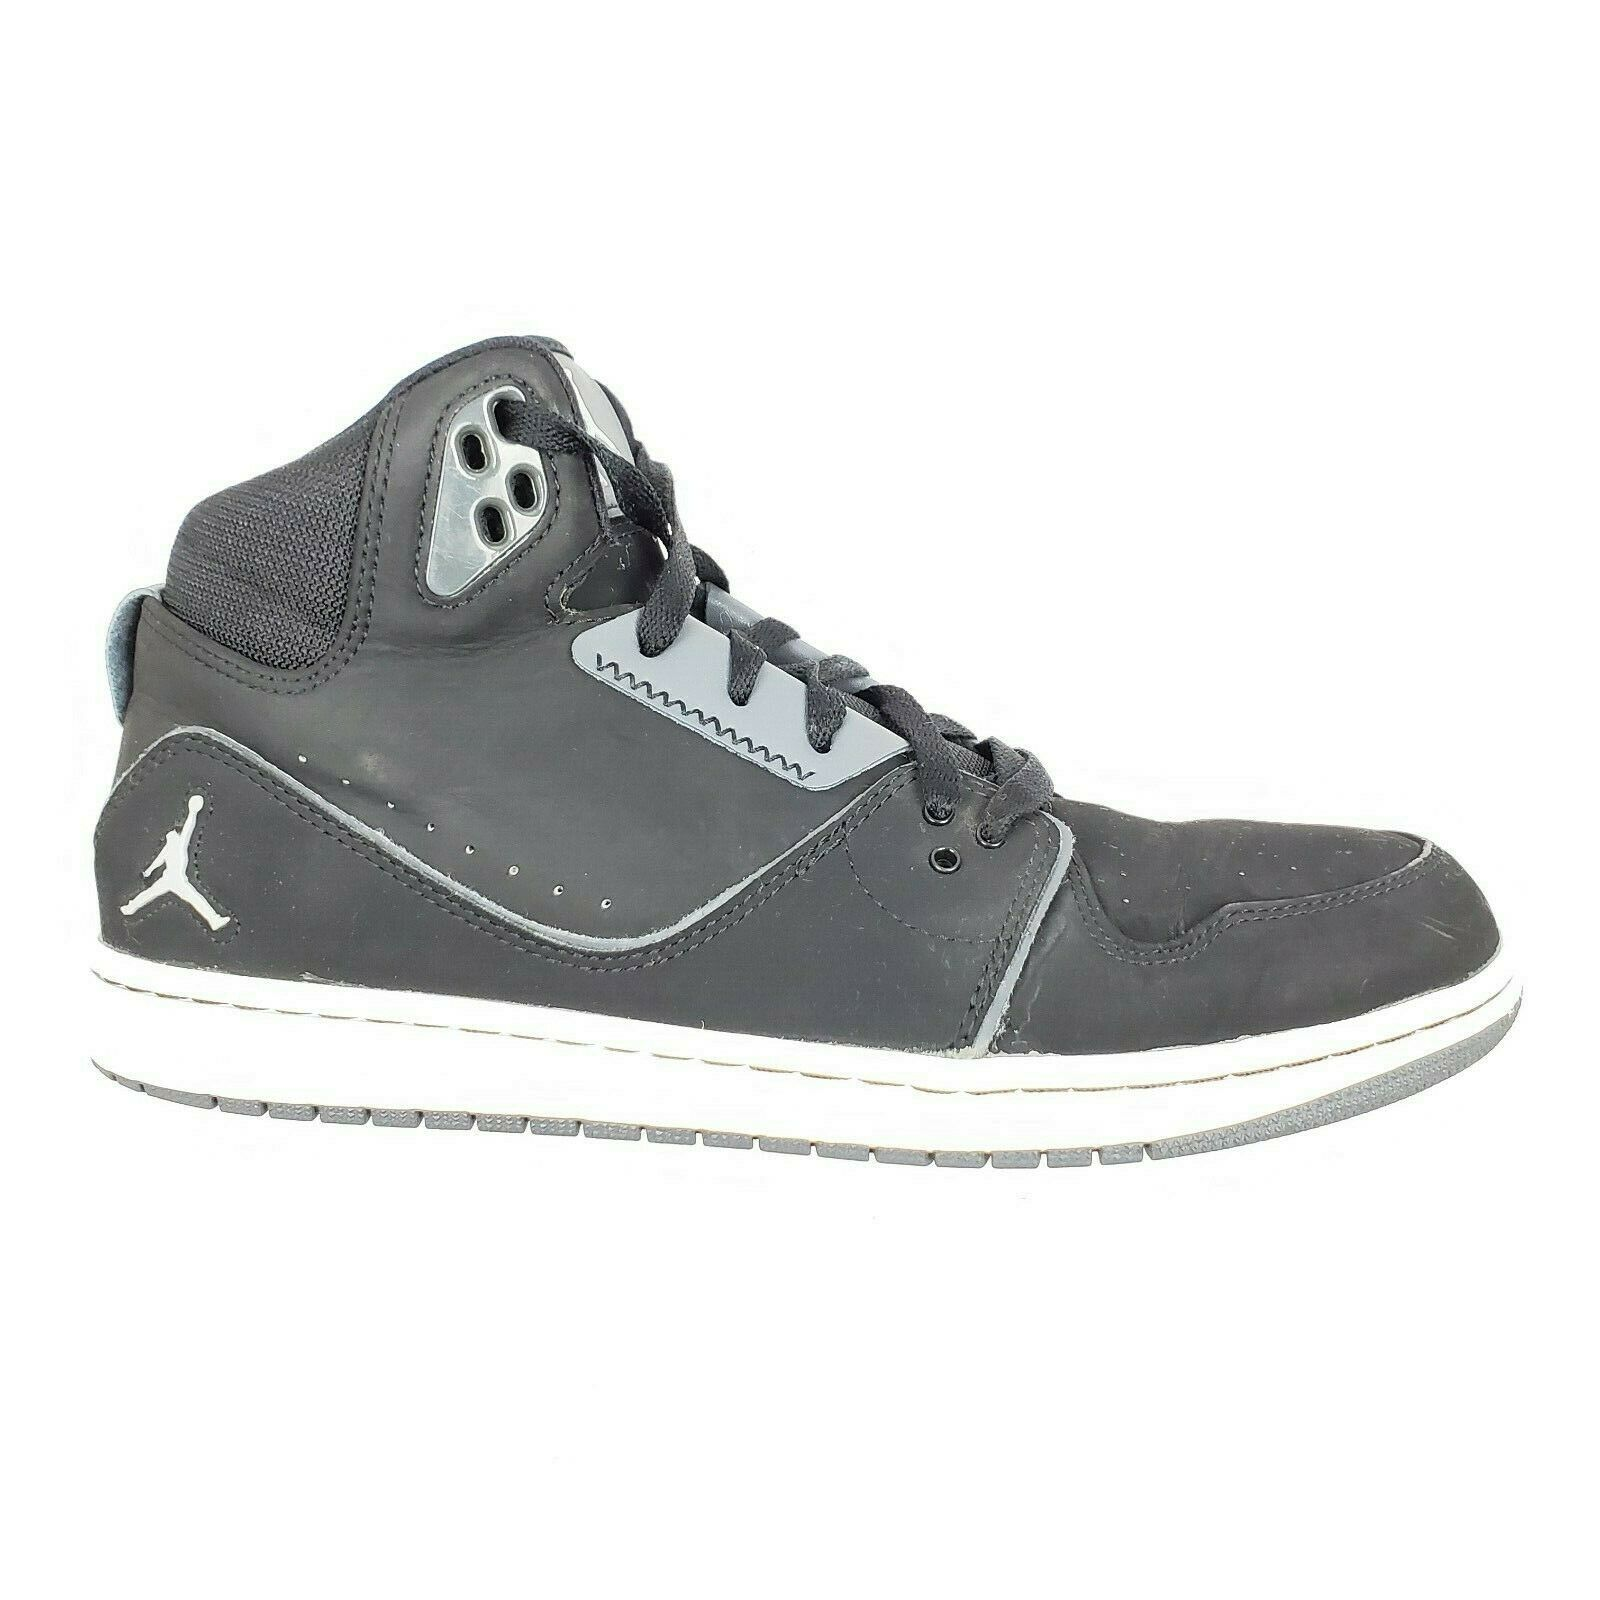 Air Jordan 1 Flight 2 shoes Mens Size 11 Black 555798-003